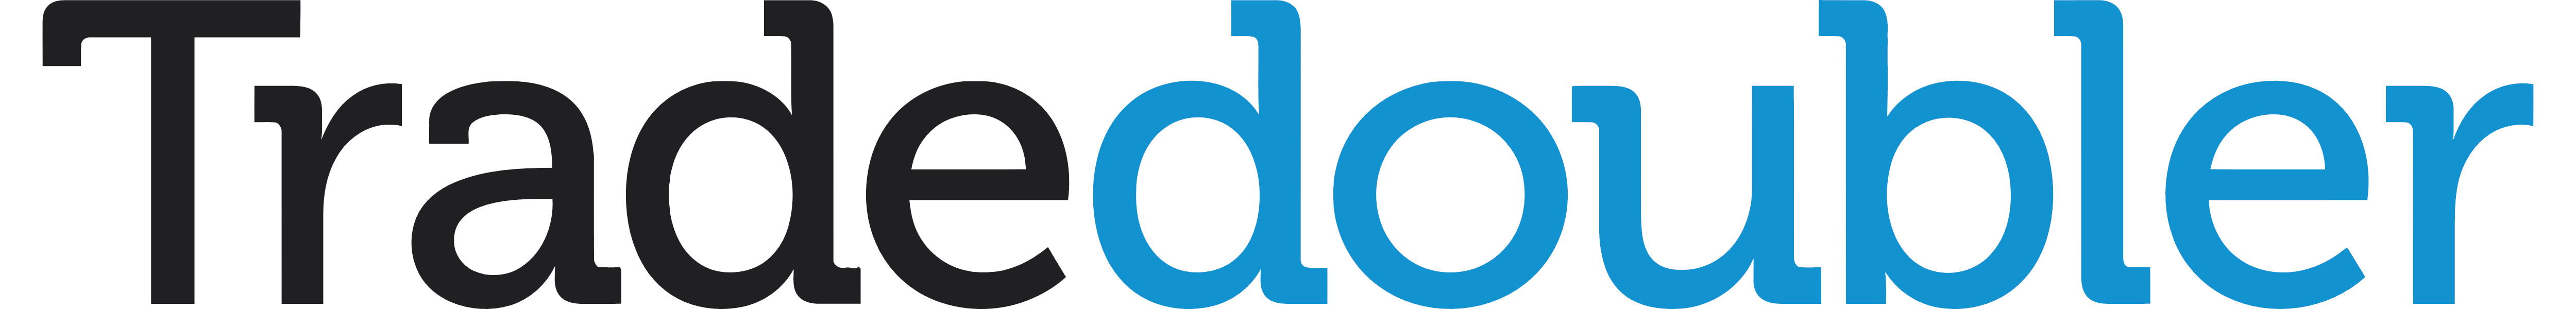 Tradedoubler Logos Download